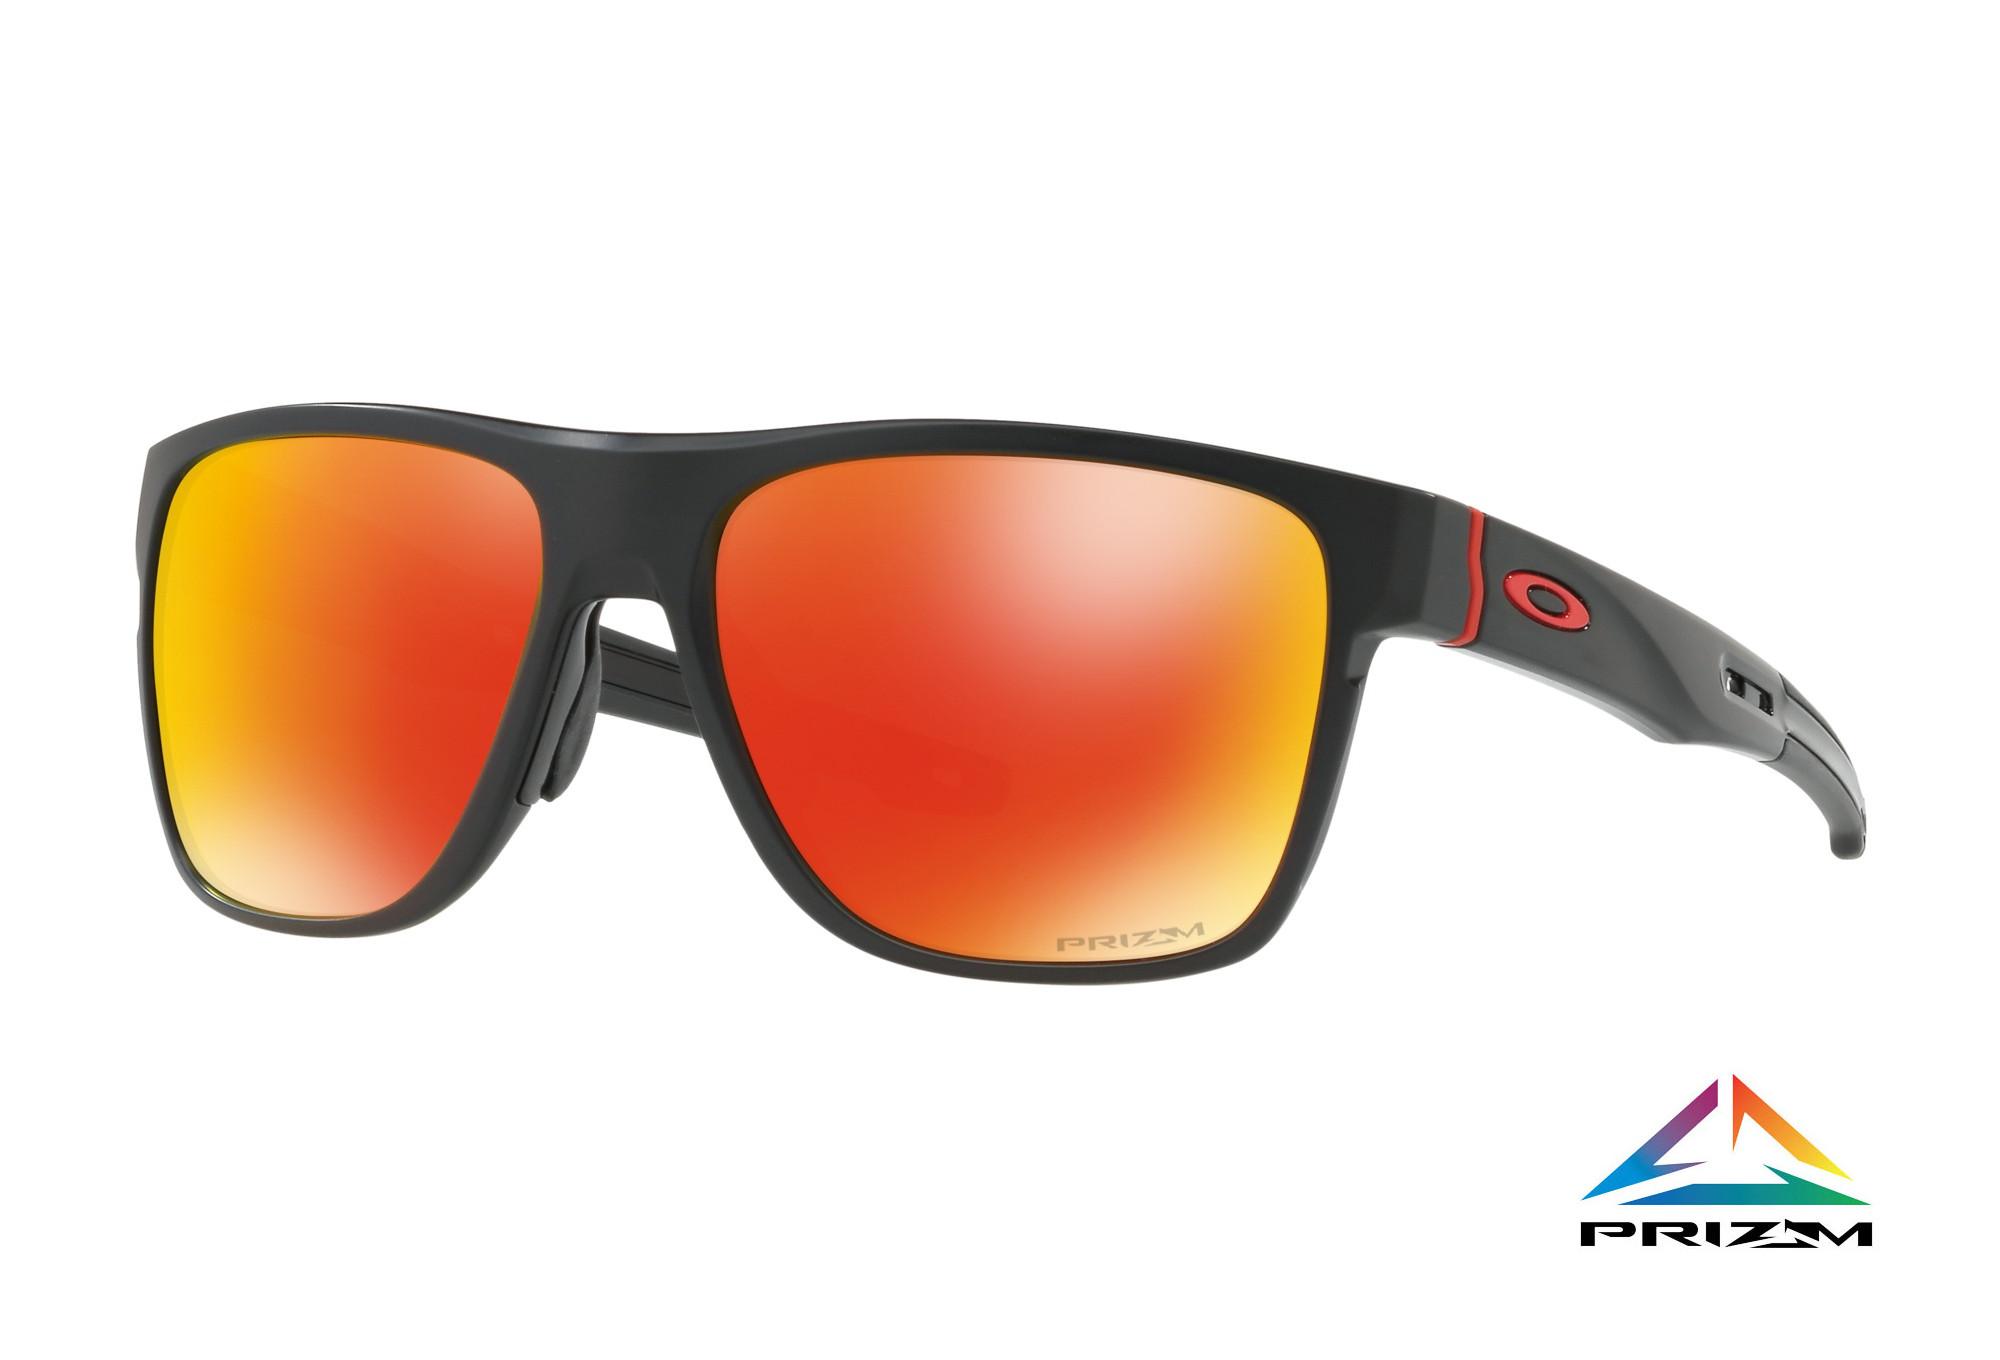 159e79ebb7 OAKLEY Sunglasses Crossrange XL Black - Prizm Ruby Ref OO9360-1258 ...